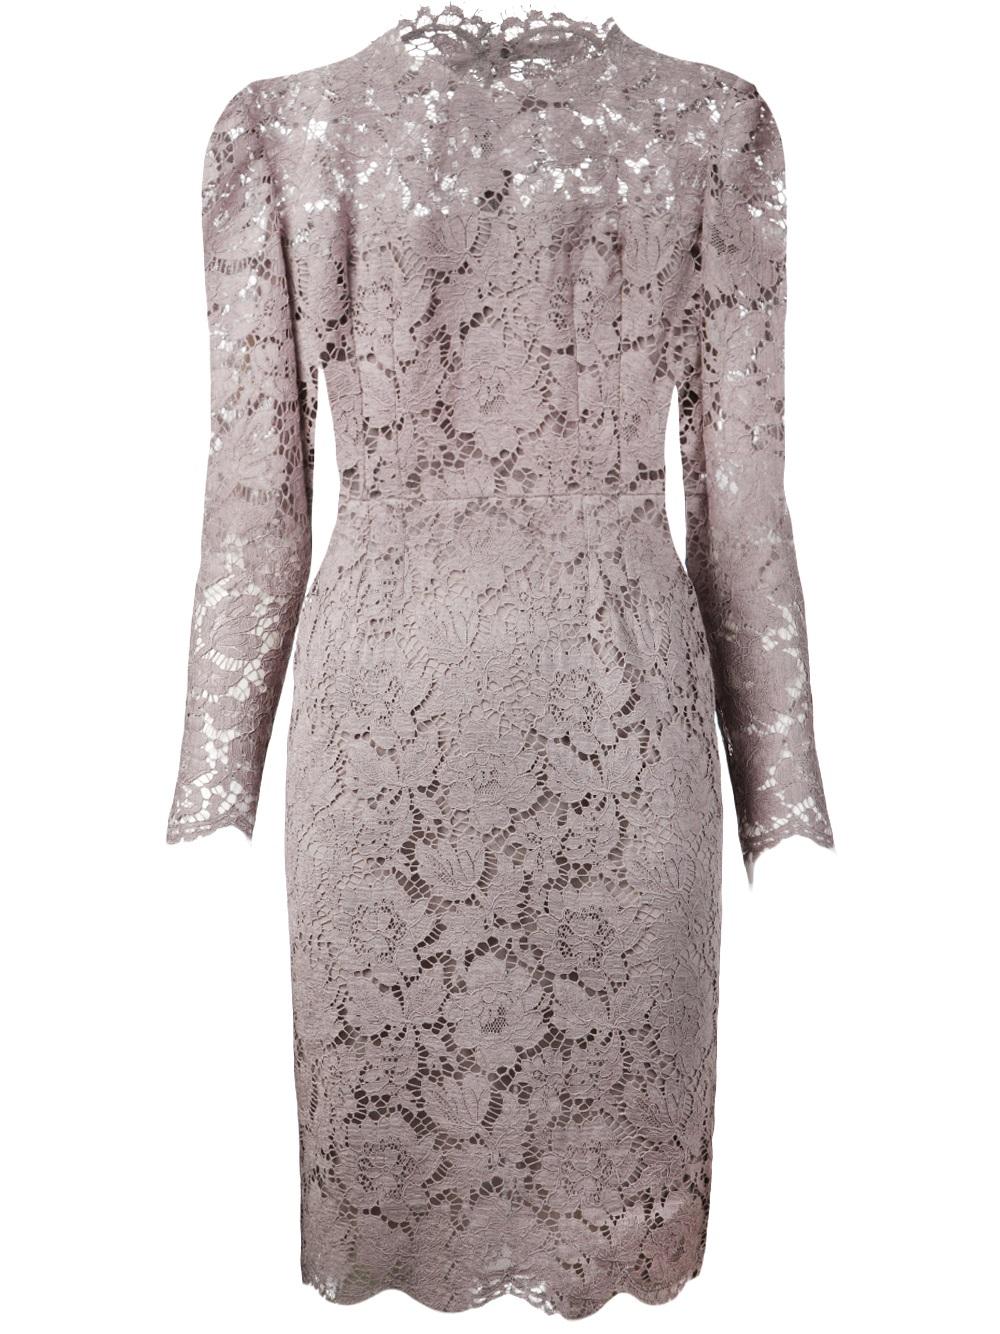 Valentino Scallop Lace Sheath Dress in Gray (grey) | Lyst